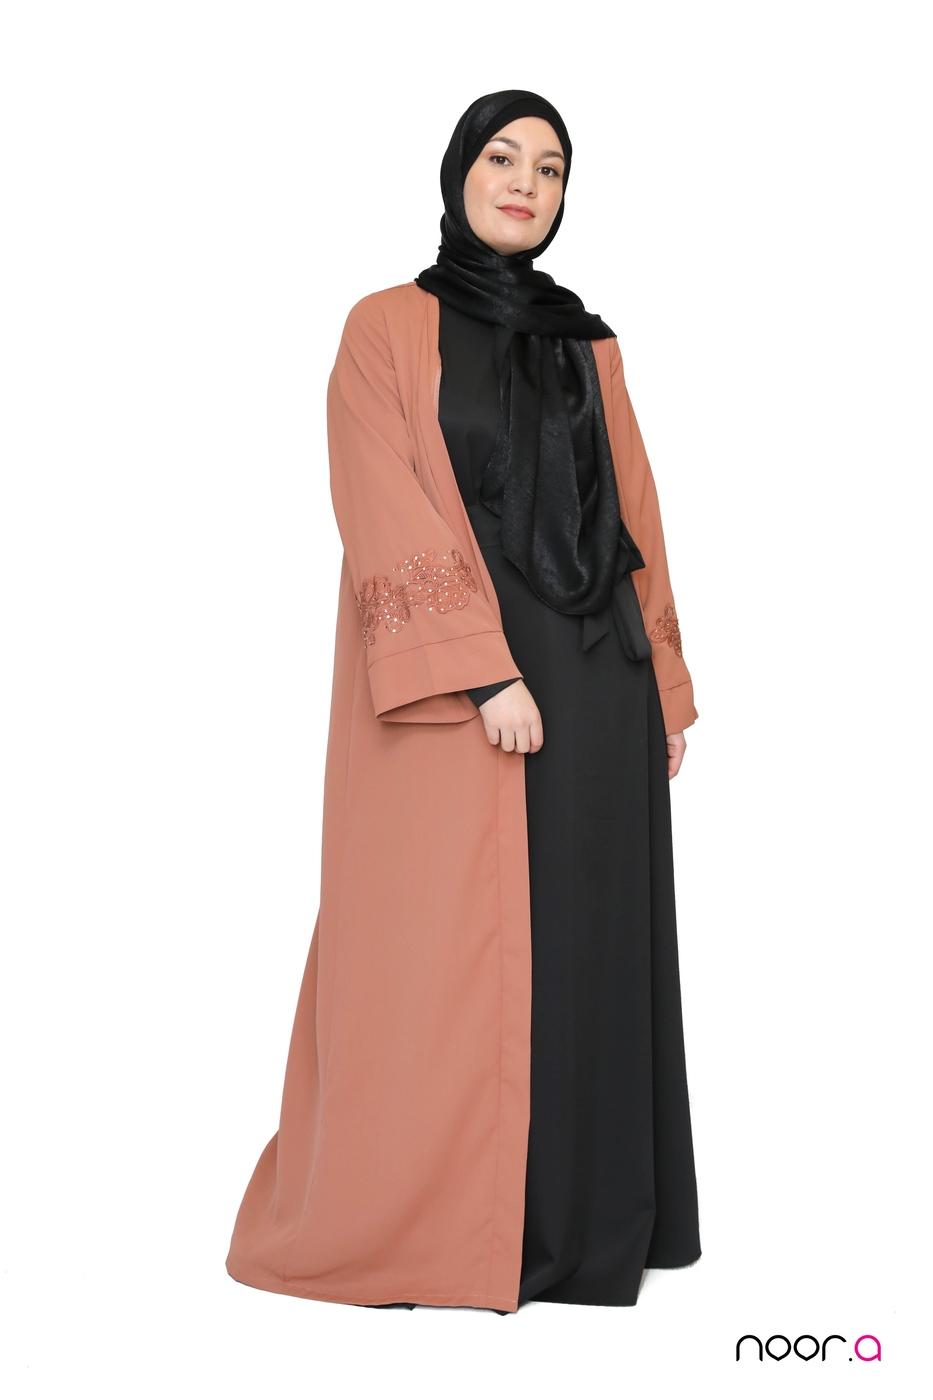 kimono-strass-abricot-abaya-anika-noire-hijab-bambou-noir (8)